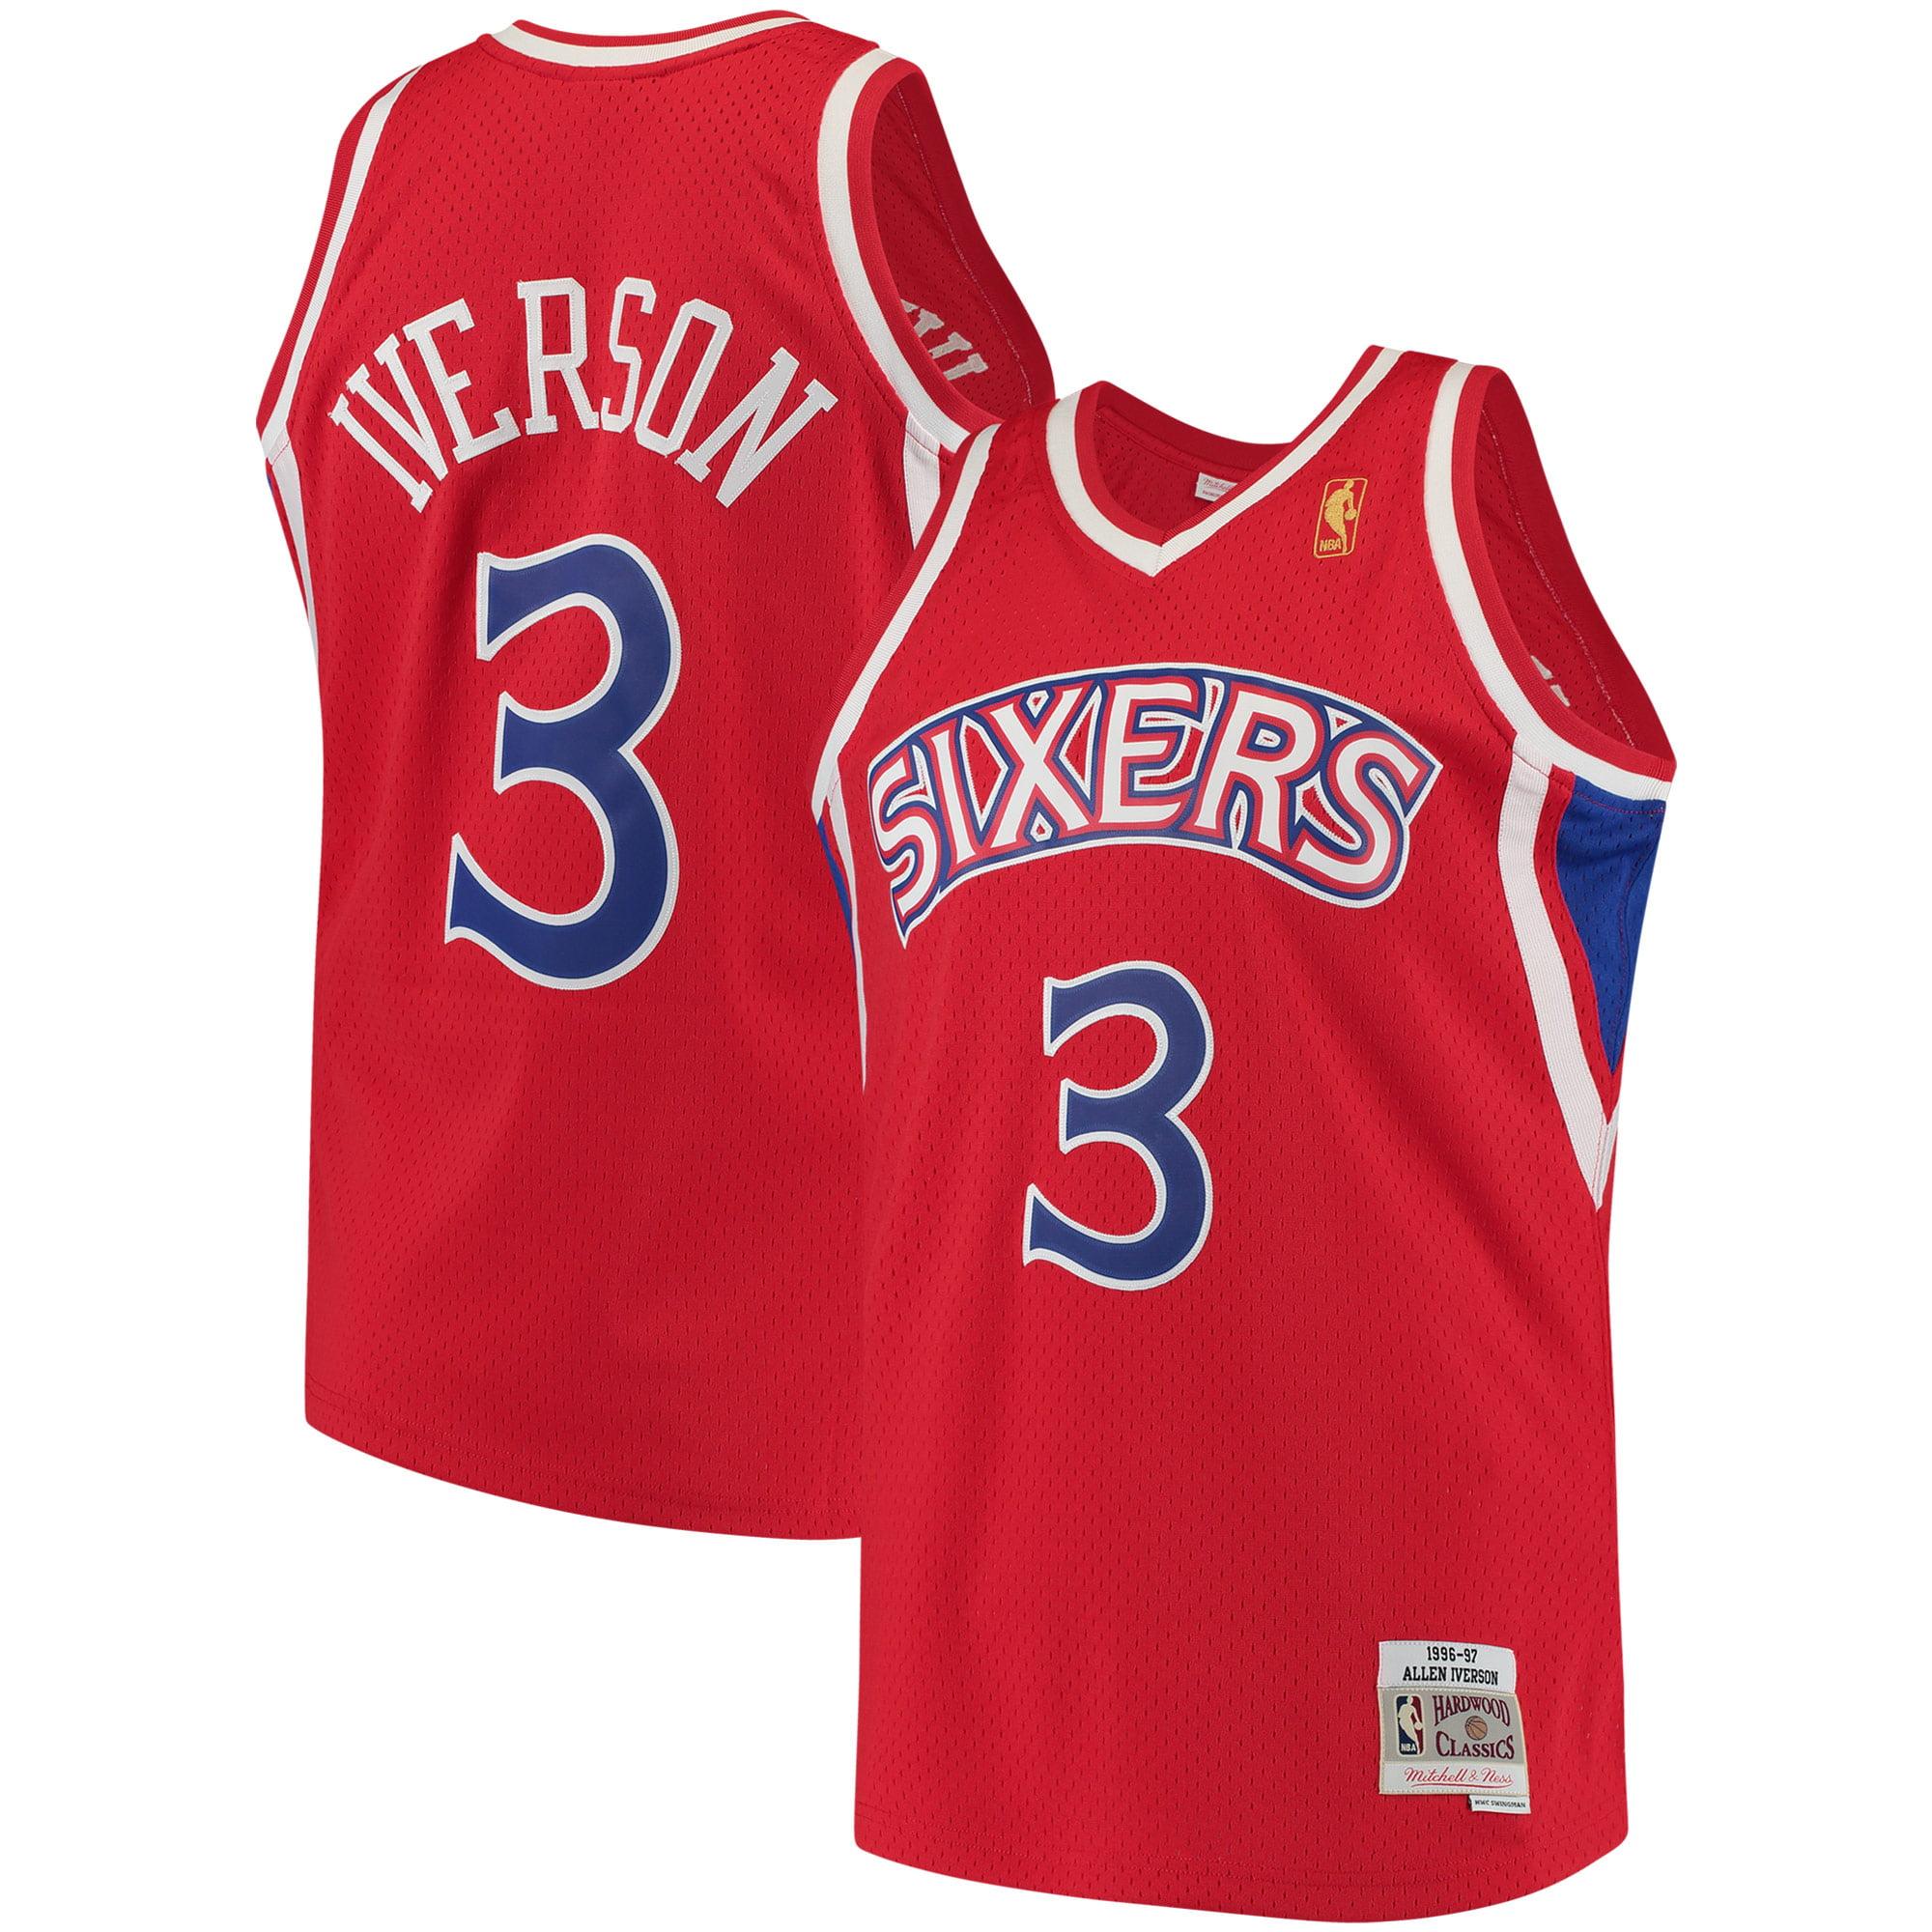 Allen Iverson Philadelphia 76ers Mitchell & Ness 1996-97 Hardwood Classics Swingman Jersey - Red